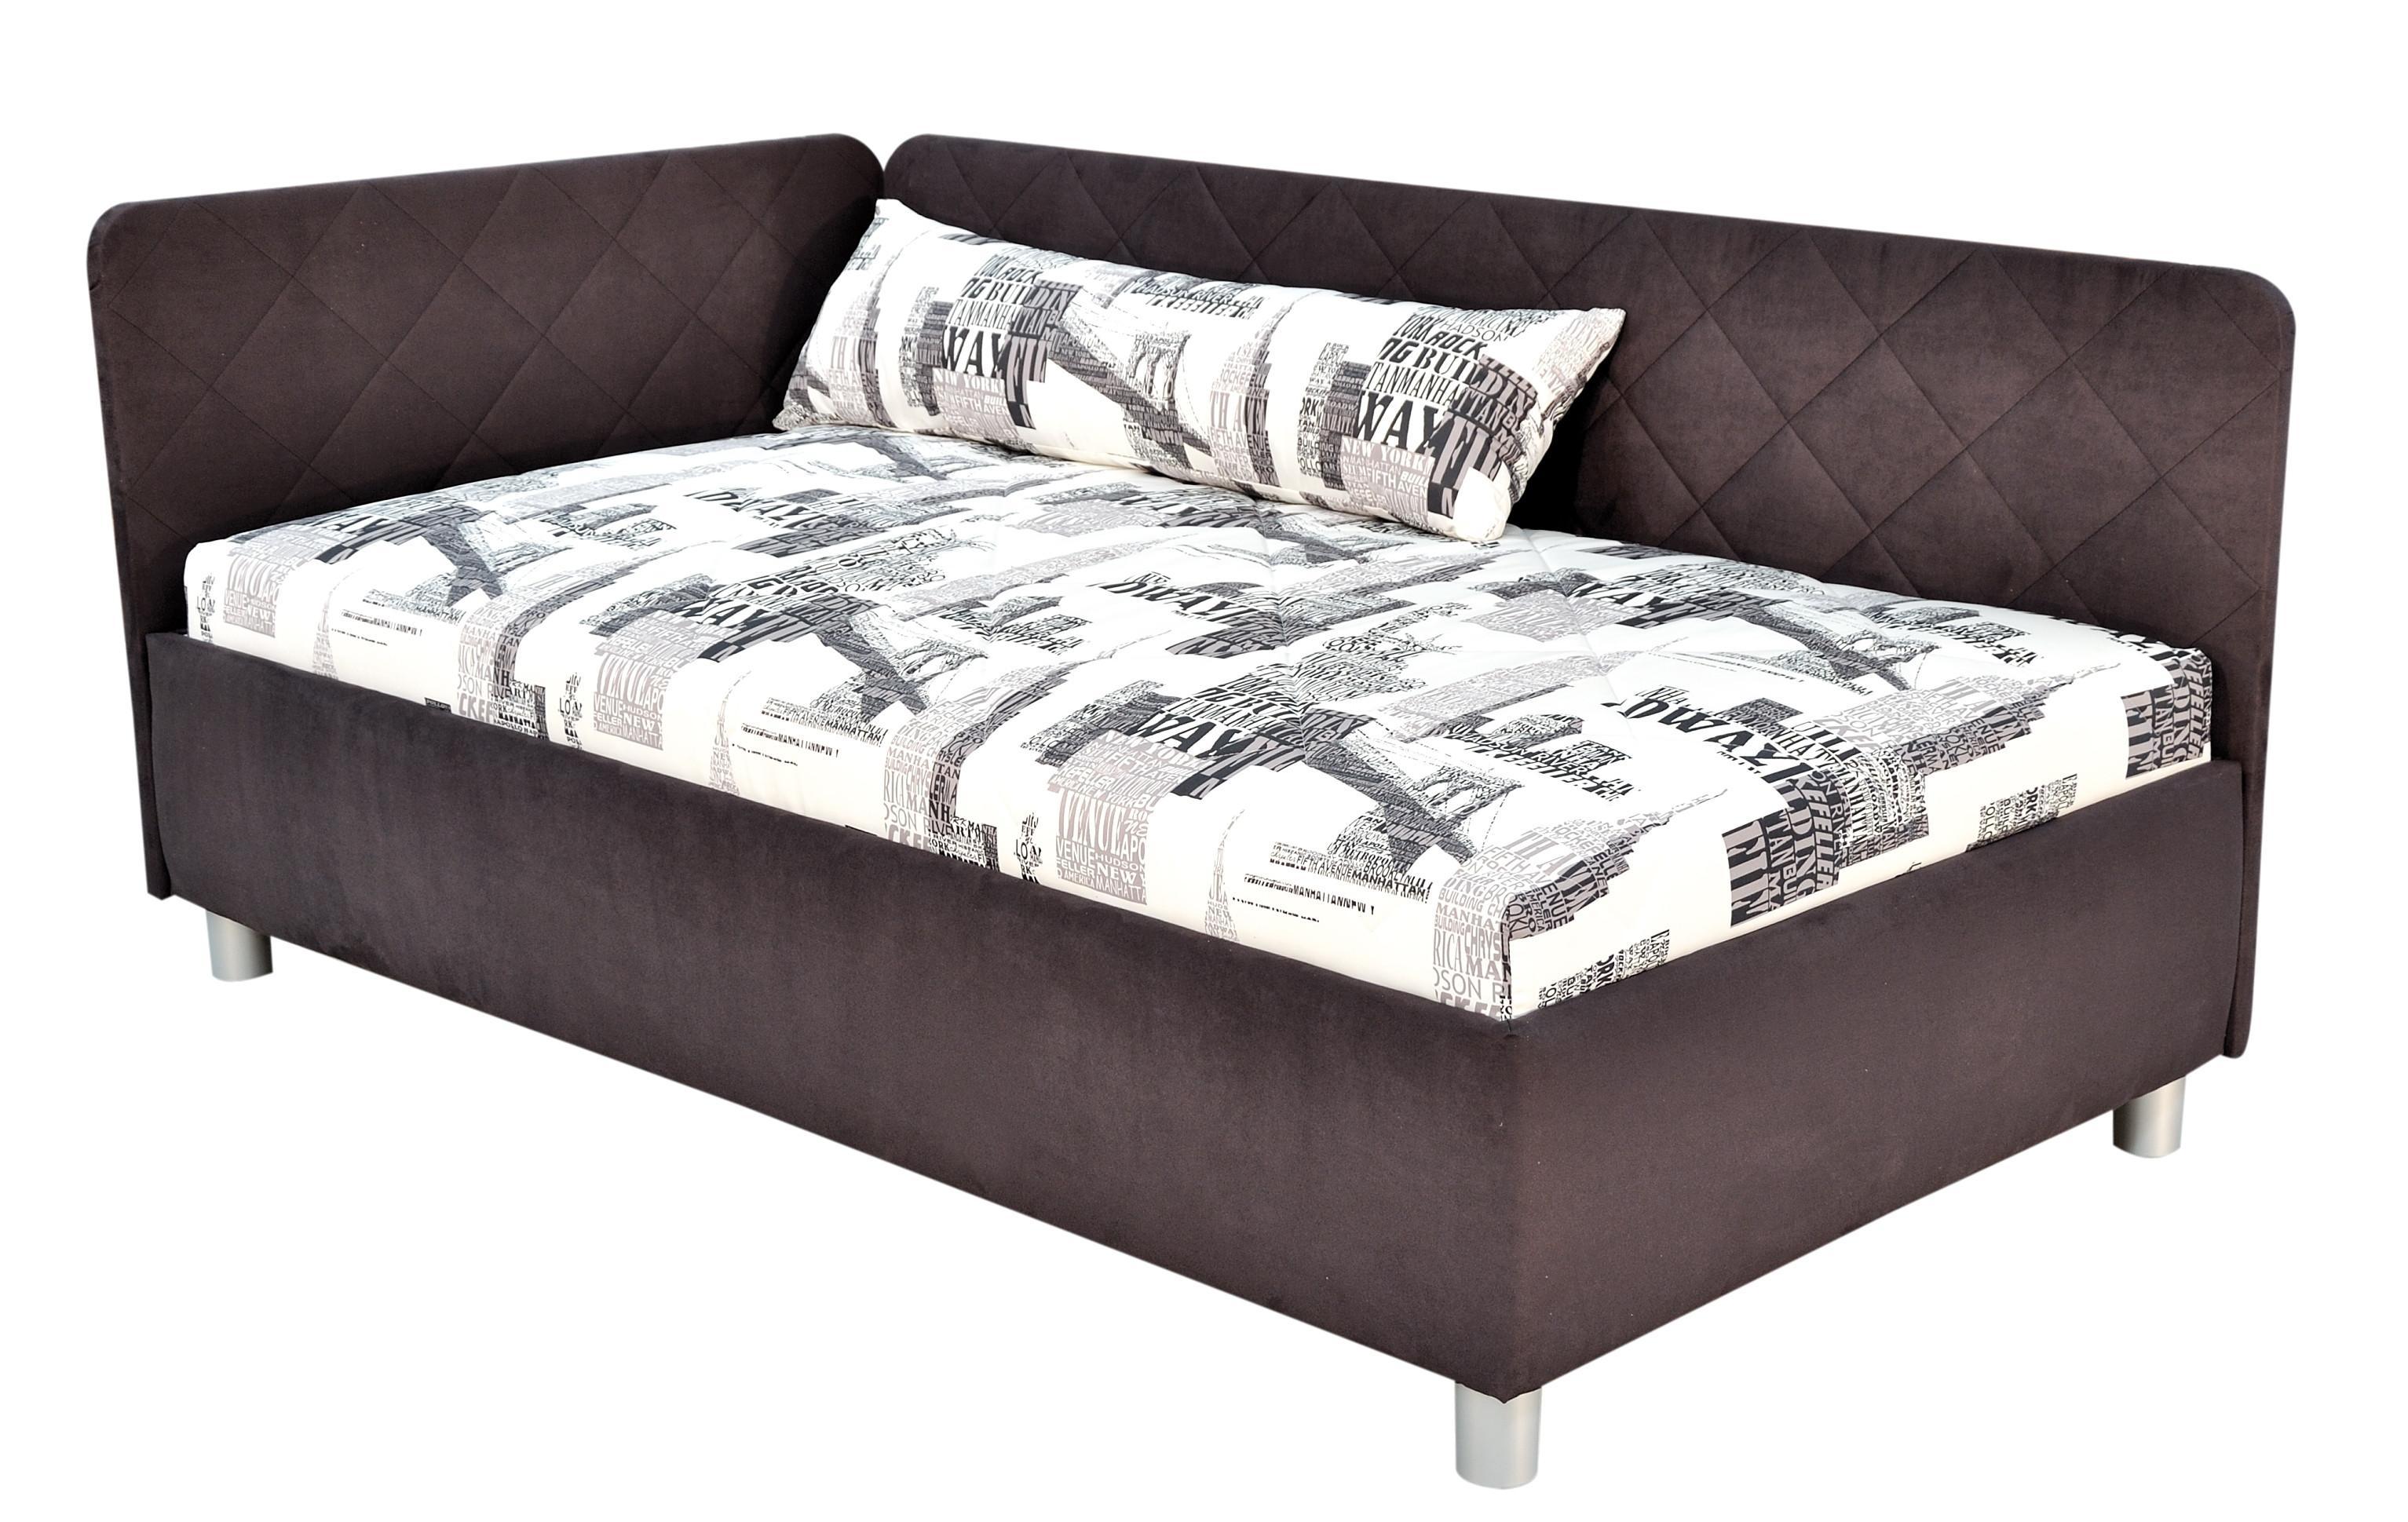 f4c0aebd5e0e Jednolôžkové postele • Möbelix